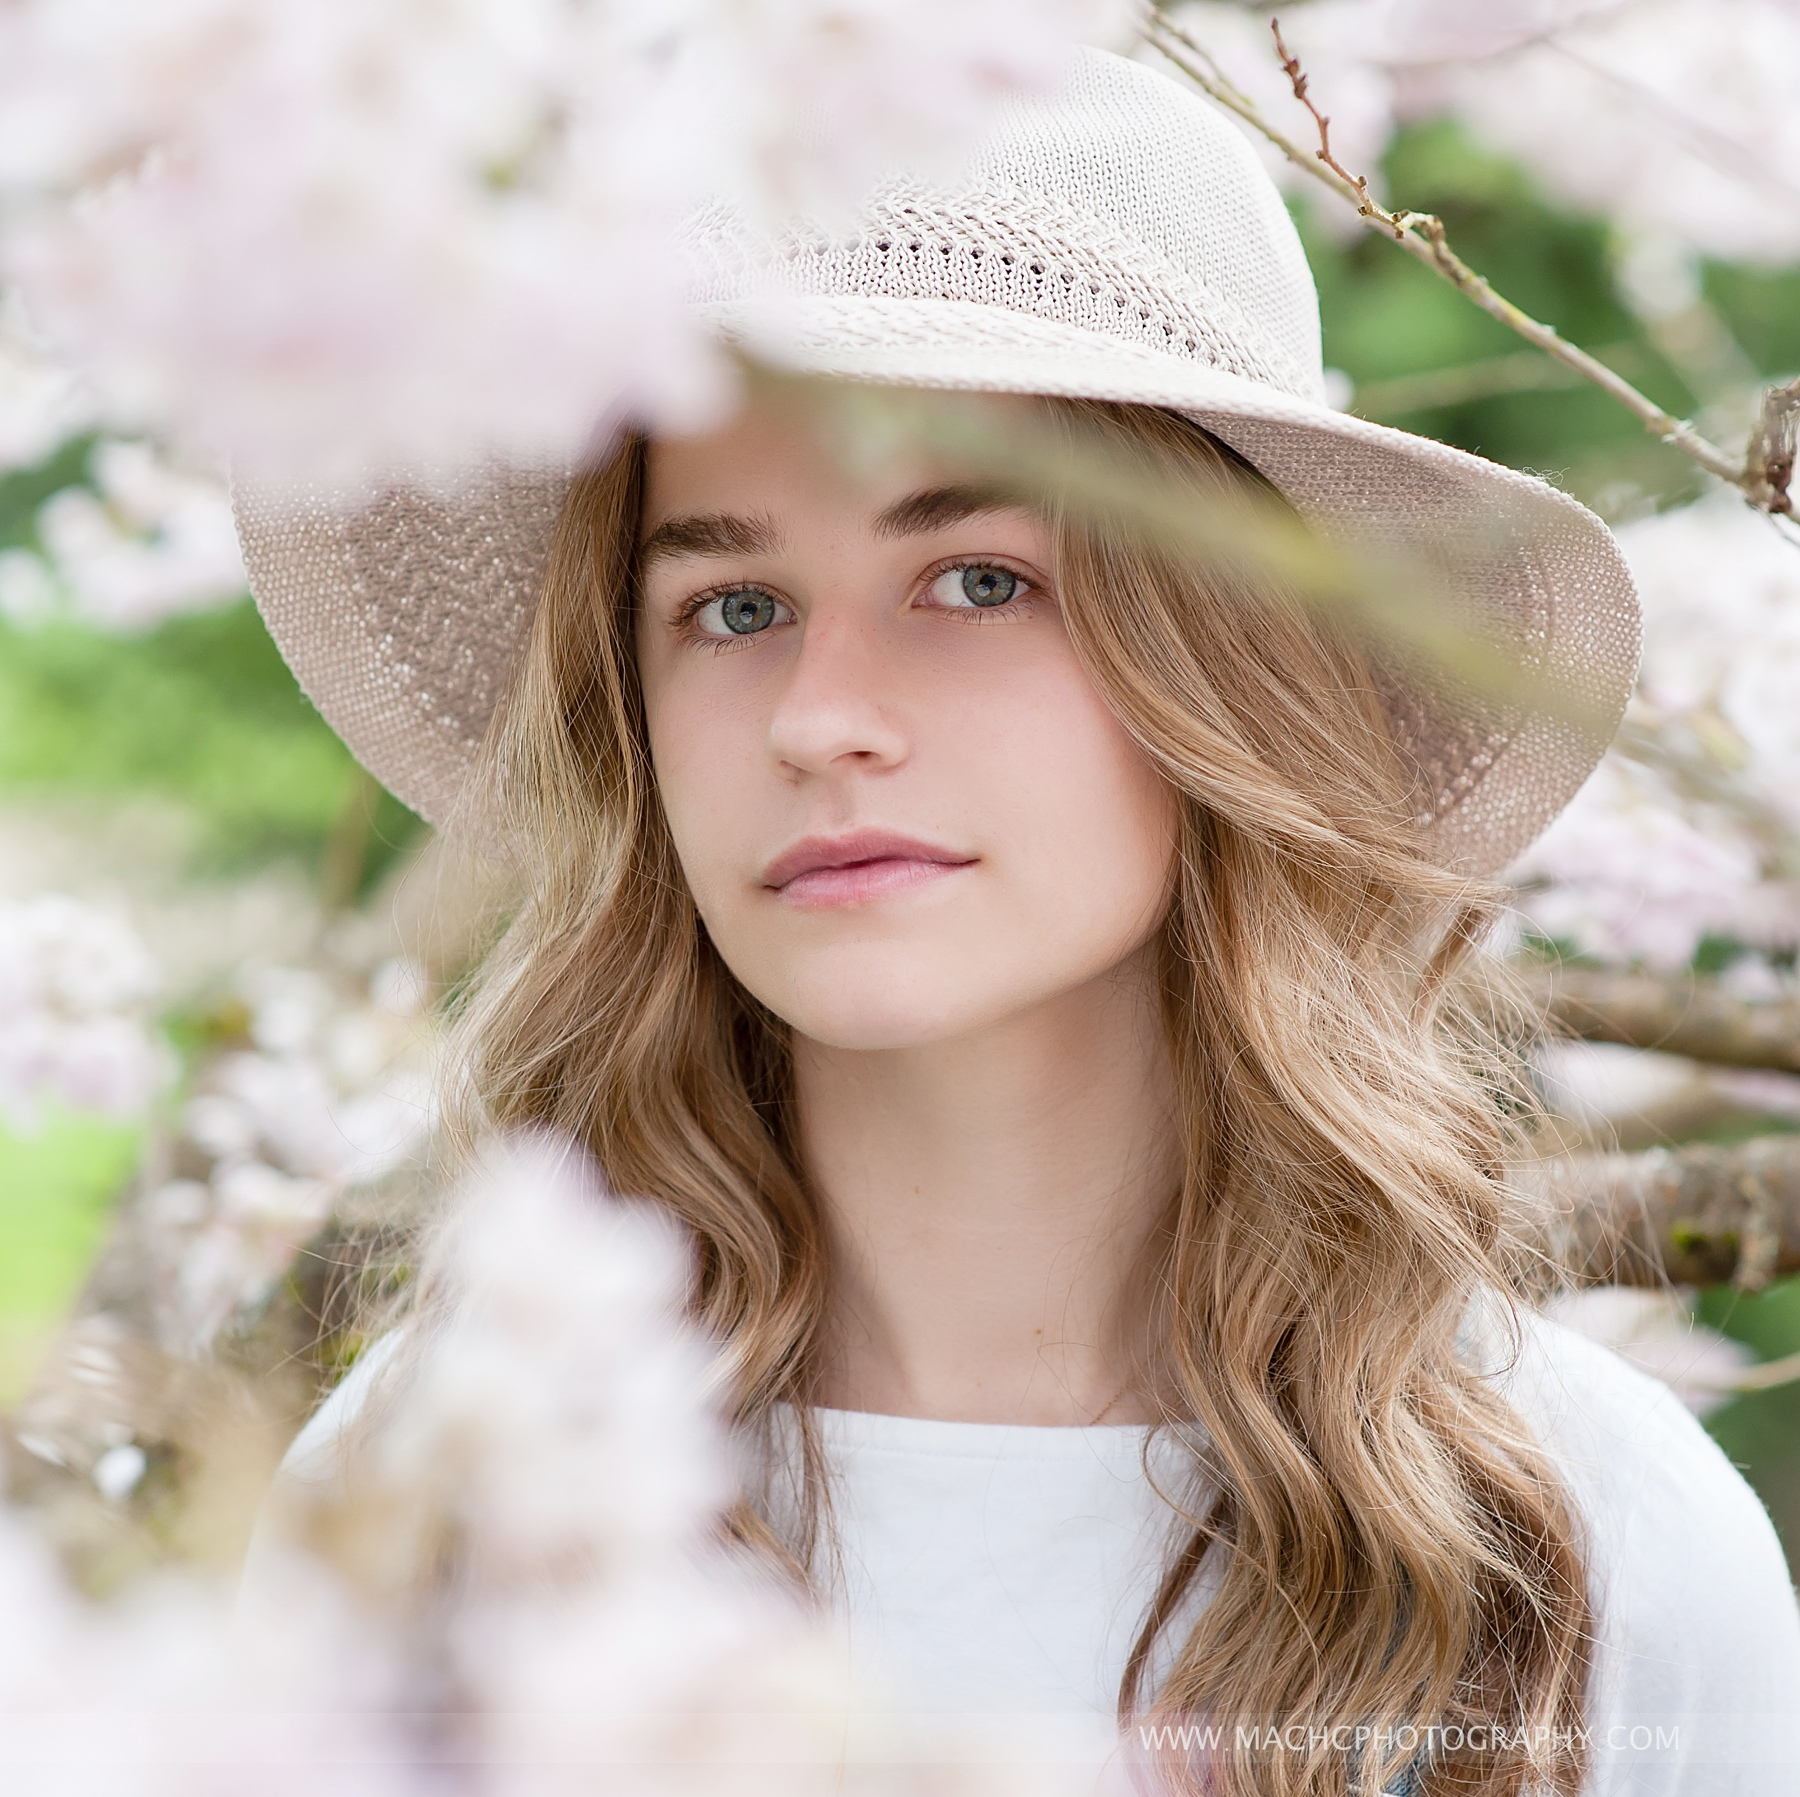 stunning elegant Senior Picture, portrait of a senior girl in spring cherry blossoms